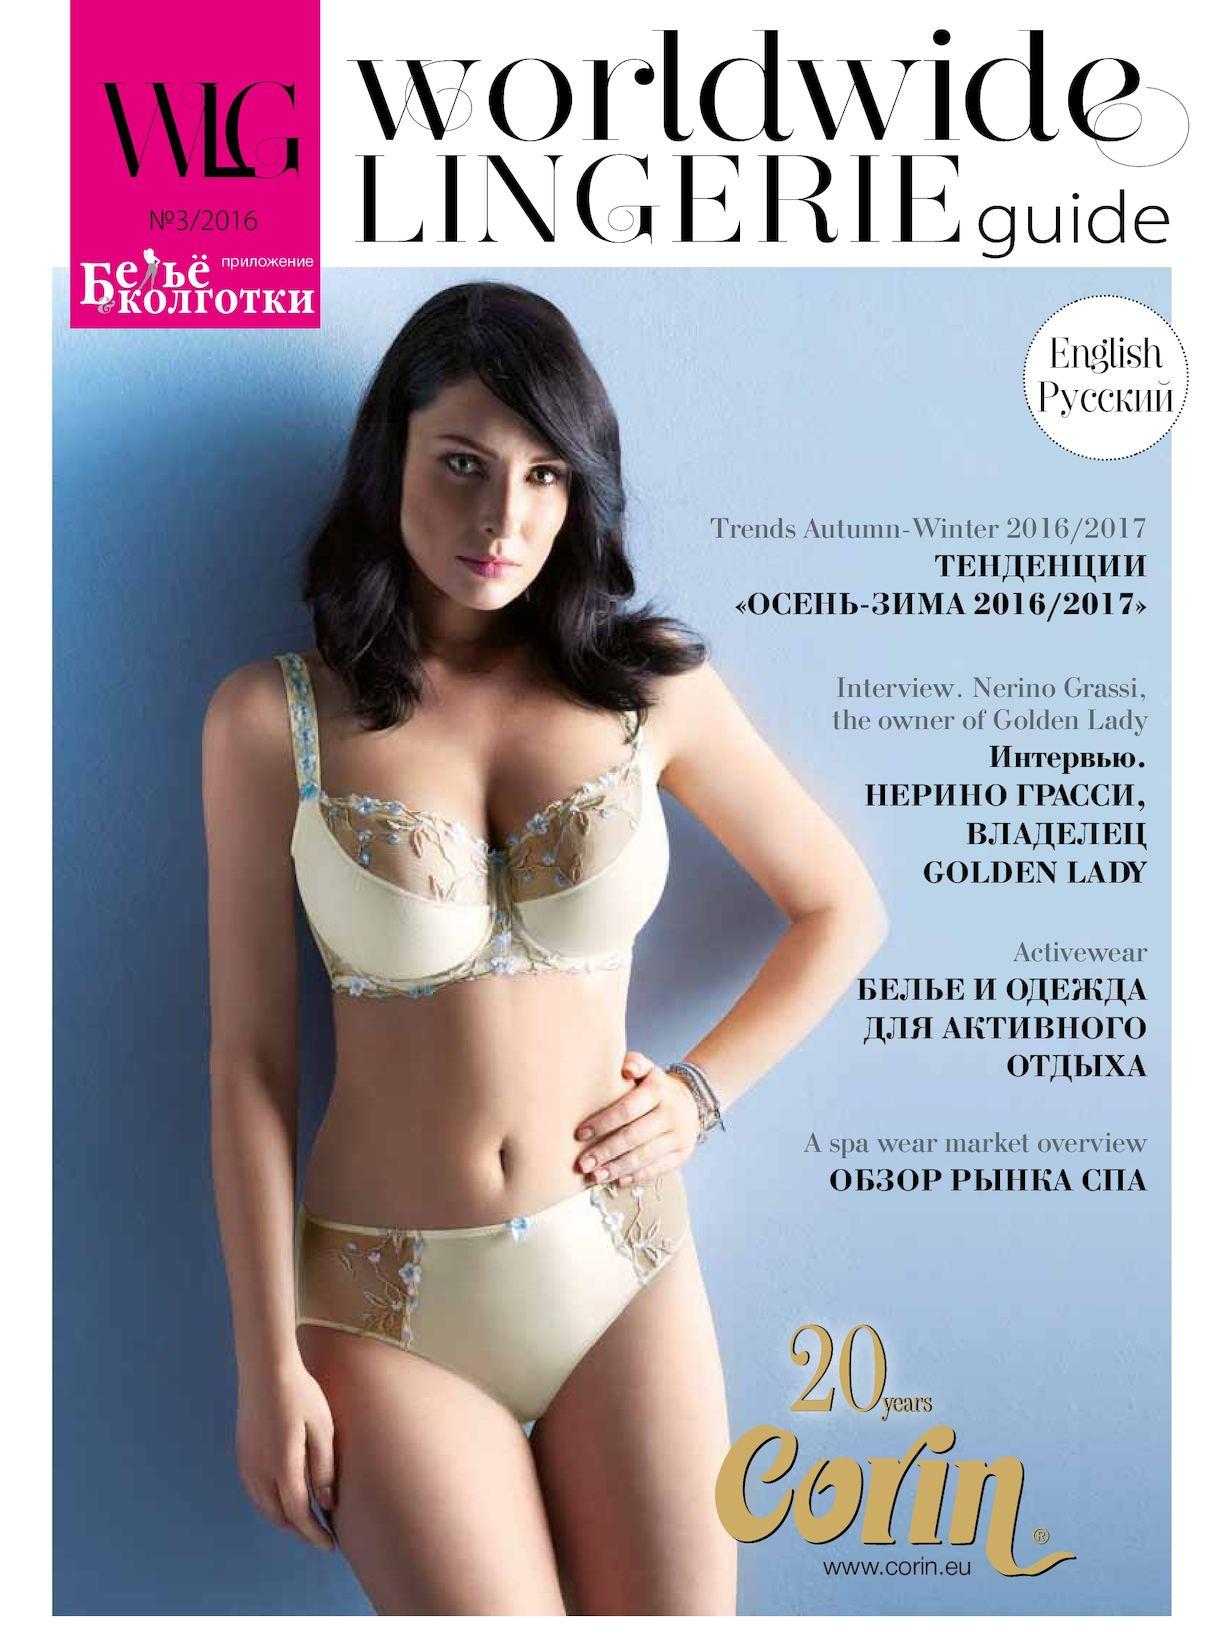 Worldwide Lingerie Guide, №3/2016